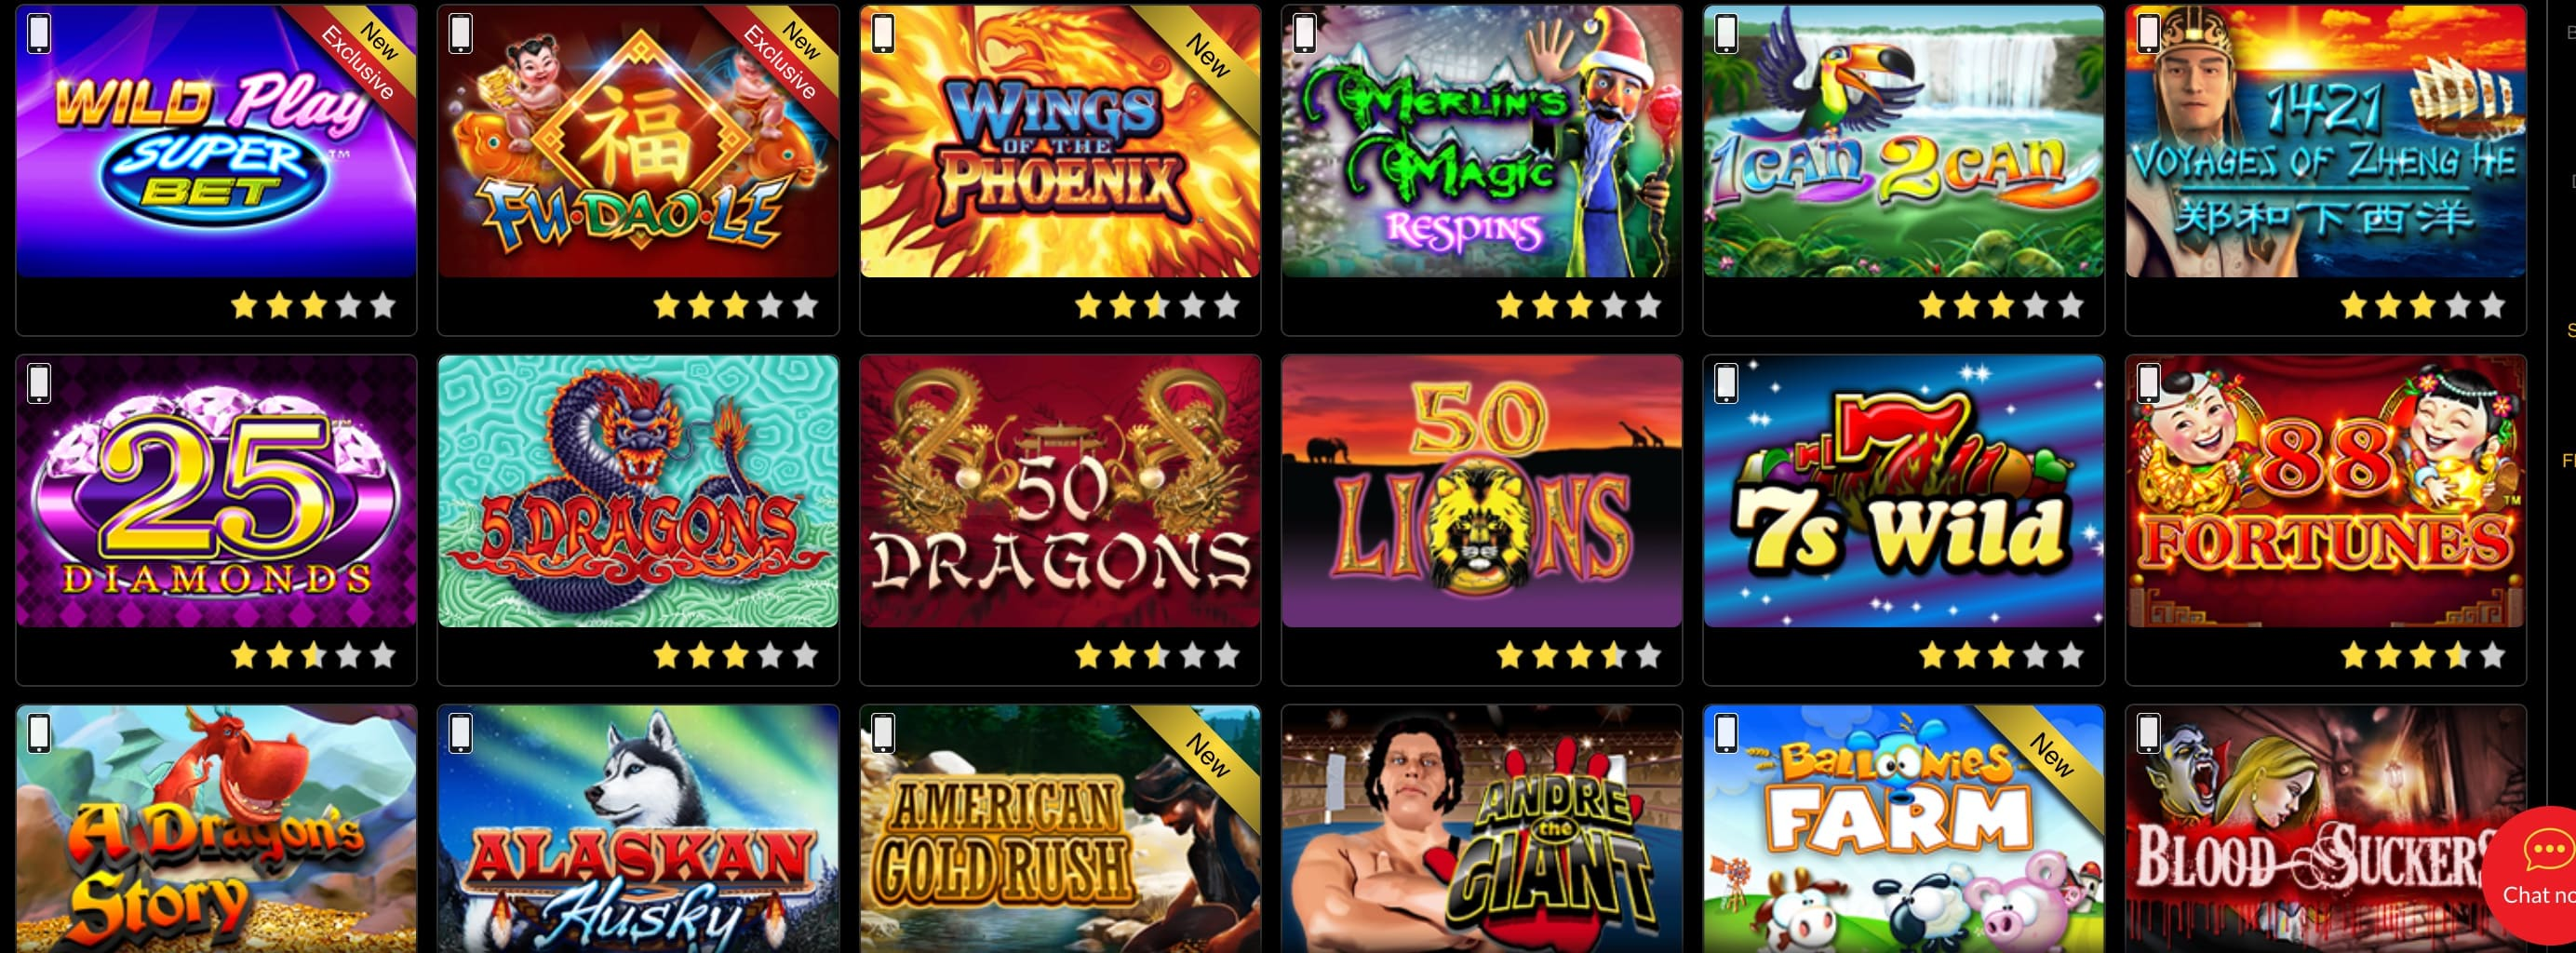 Golden city online casino direct download trump hotel and casinos